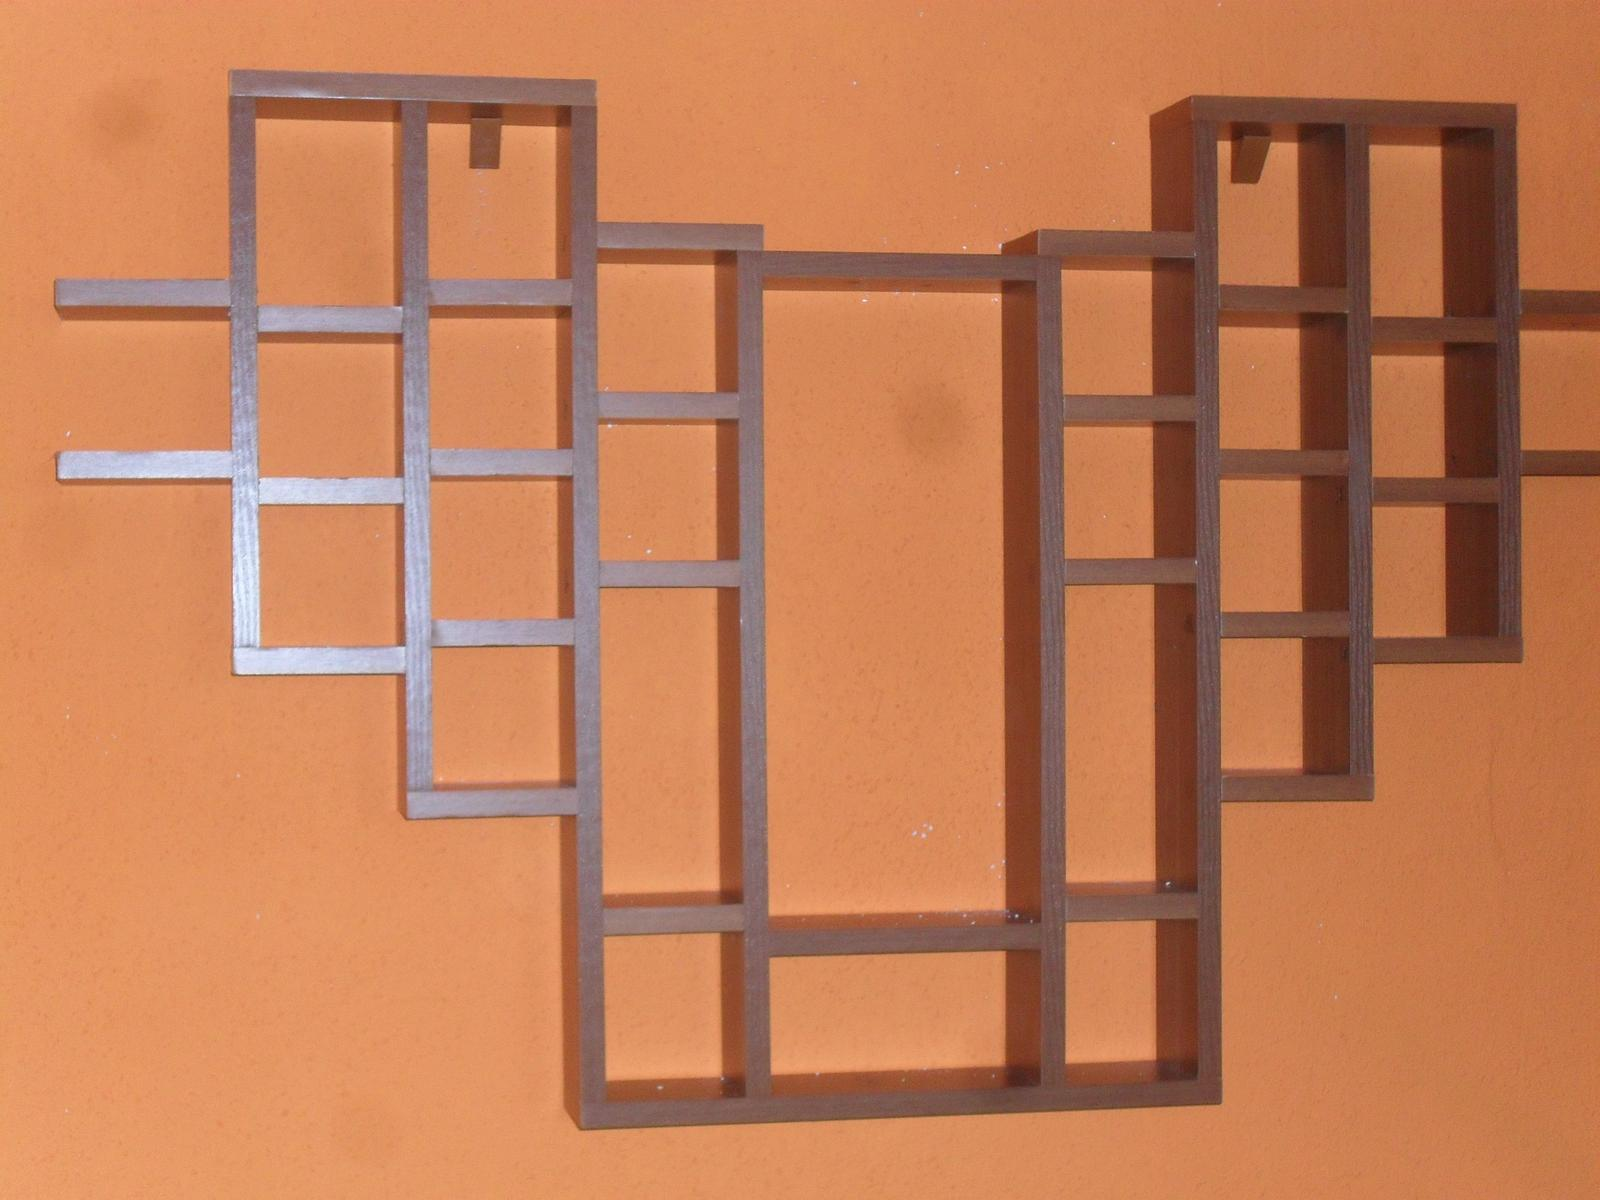 Vstavané skrine Martin Benko Bošany - Obrázok č. 80